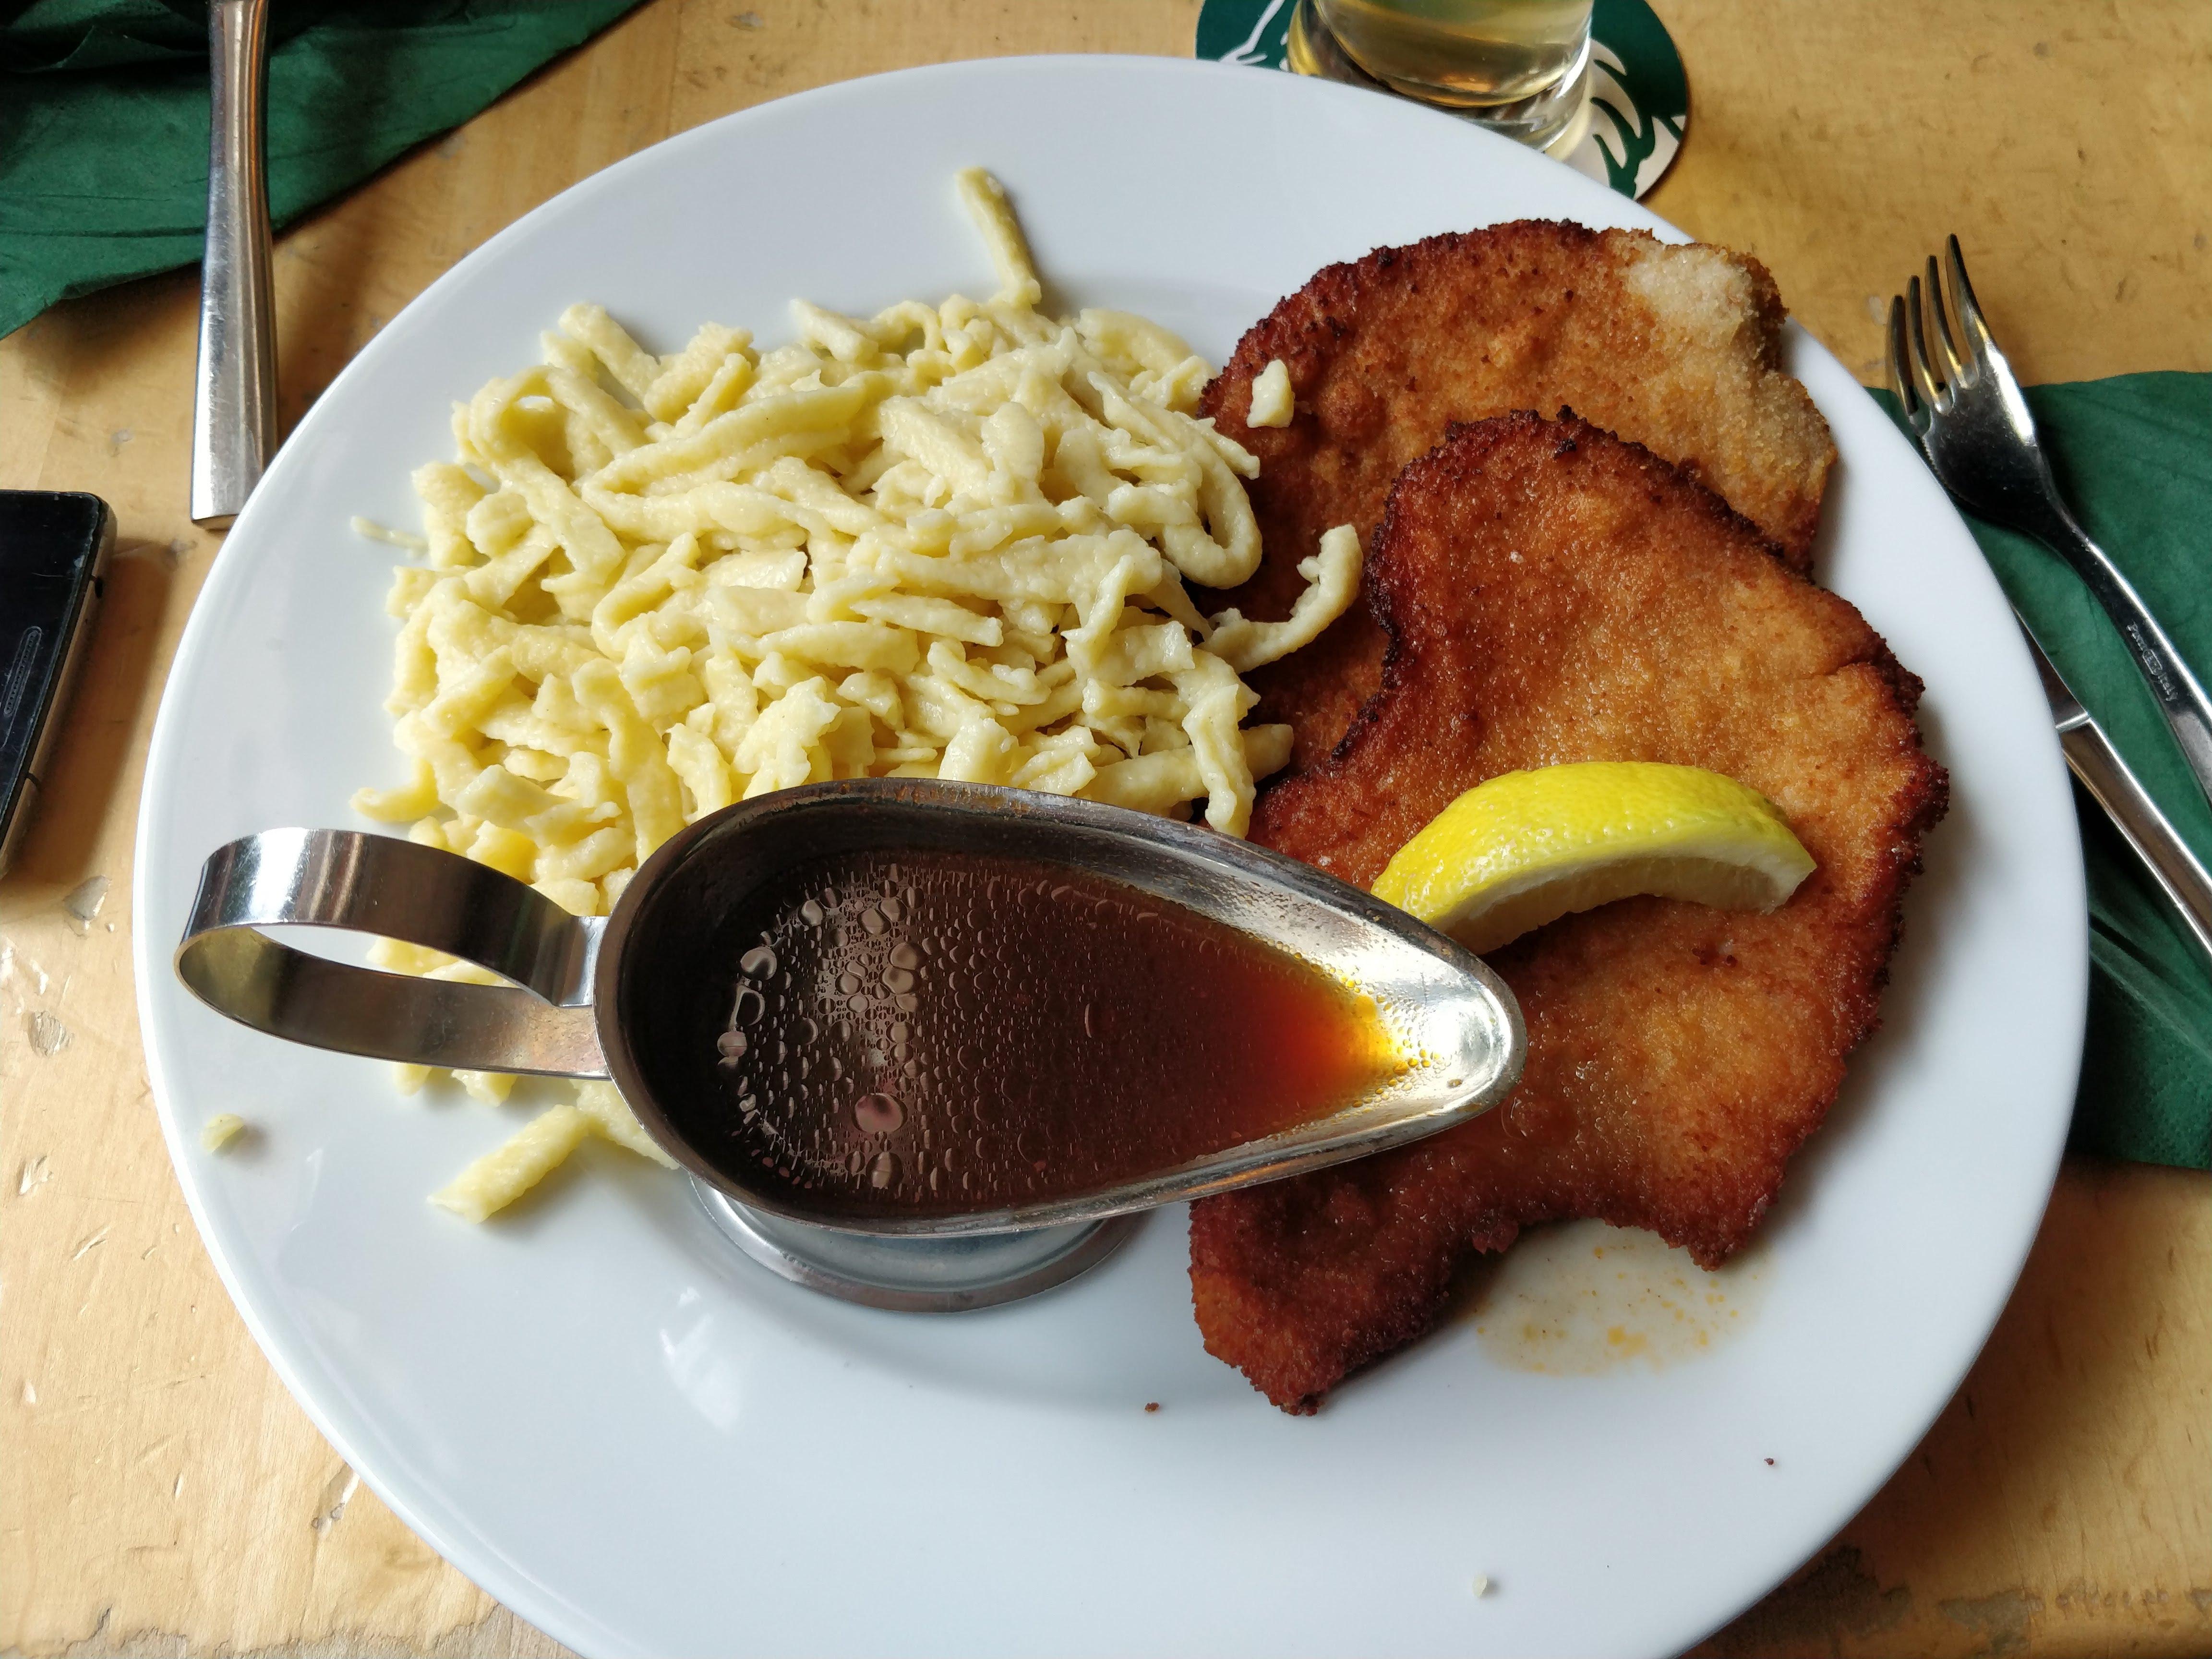 https://foodloader.net/nico_2018-05-11_panierte-schnitzel-mit-spaetzle.jpg